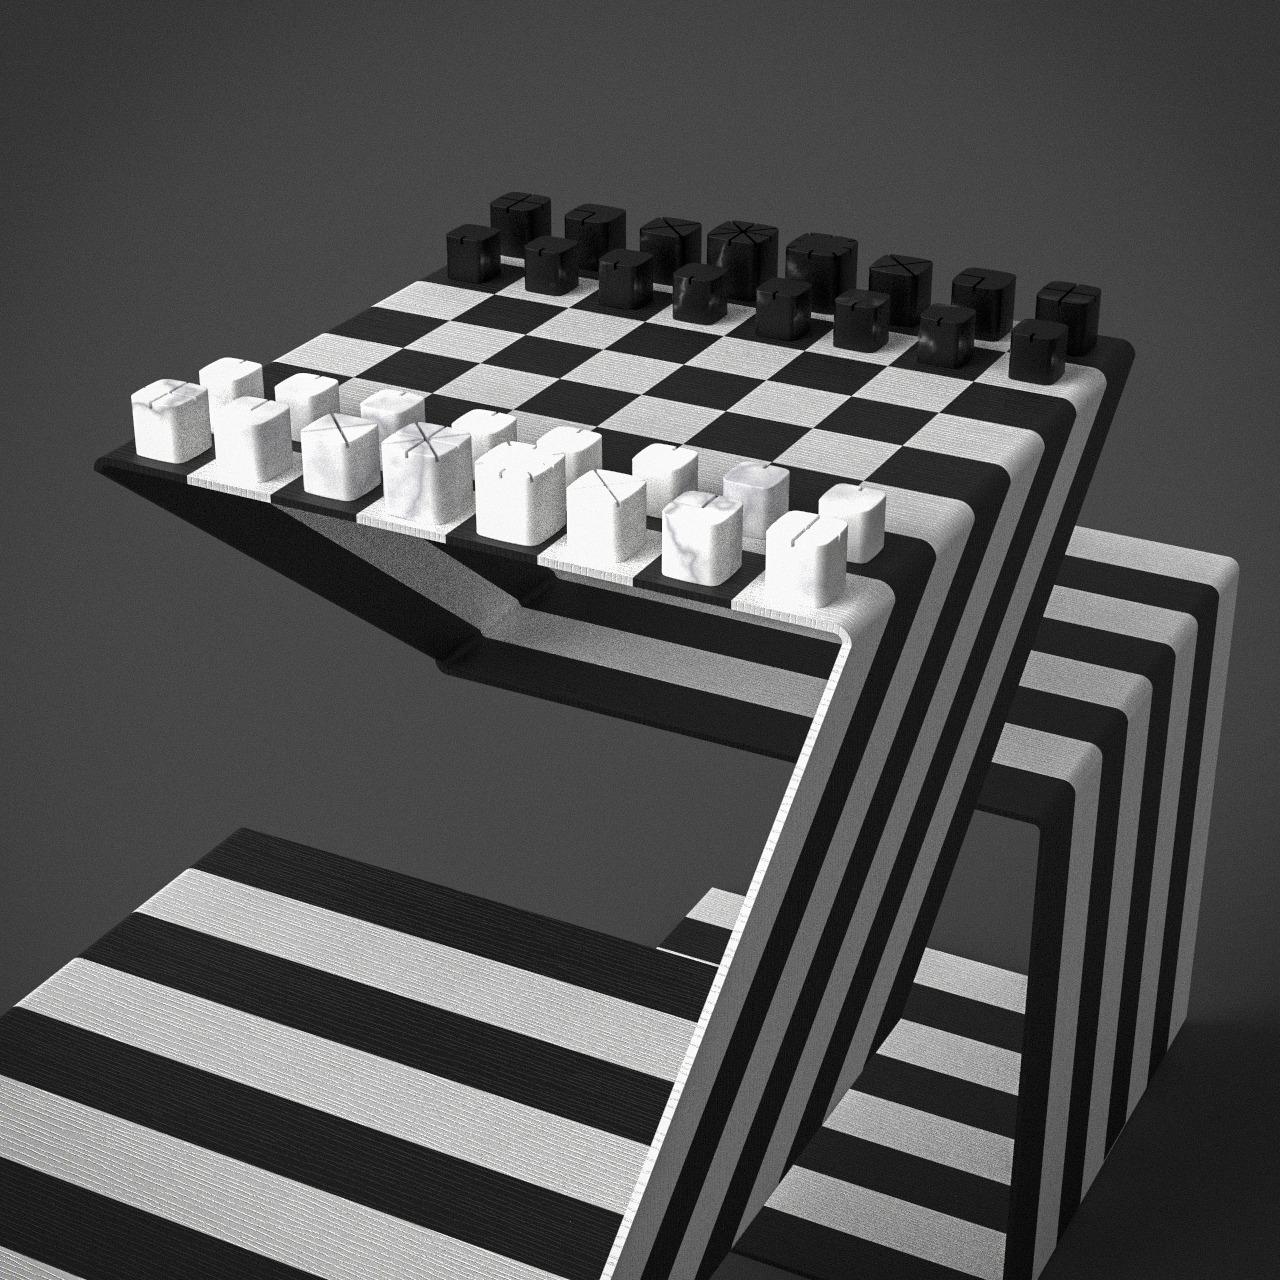 Mesa de xadrez Cambito, da Mula Preta